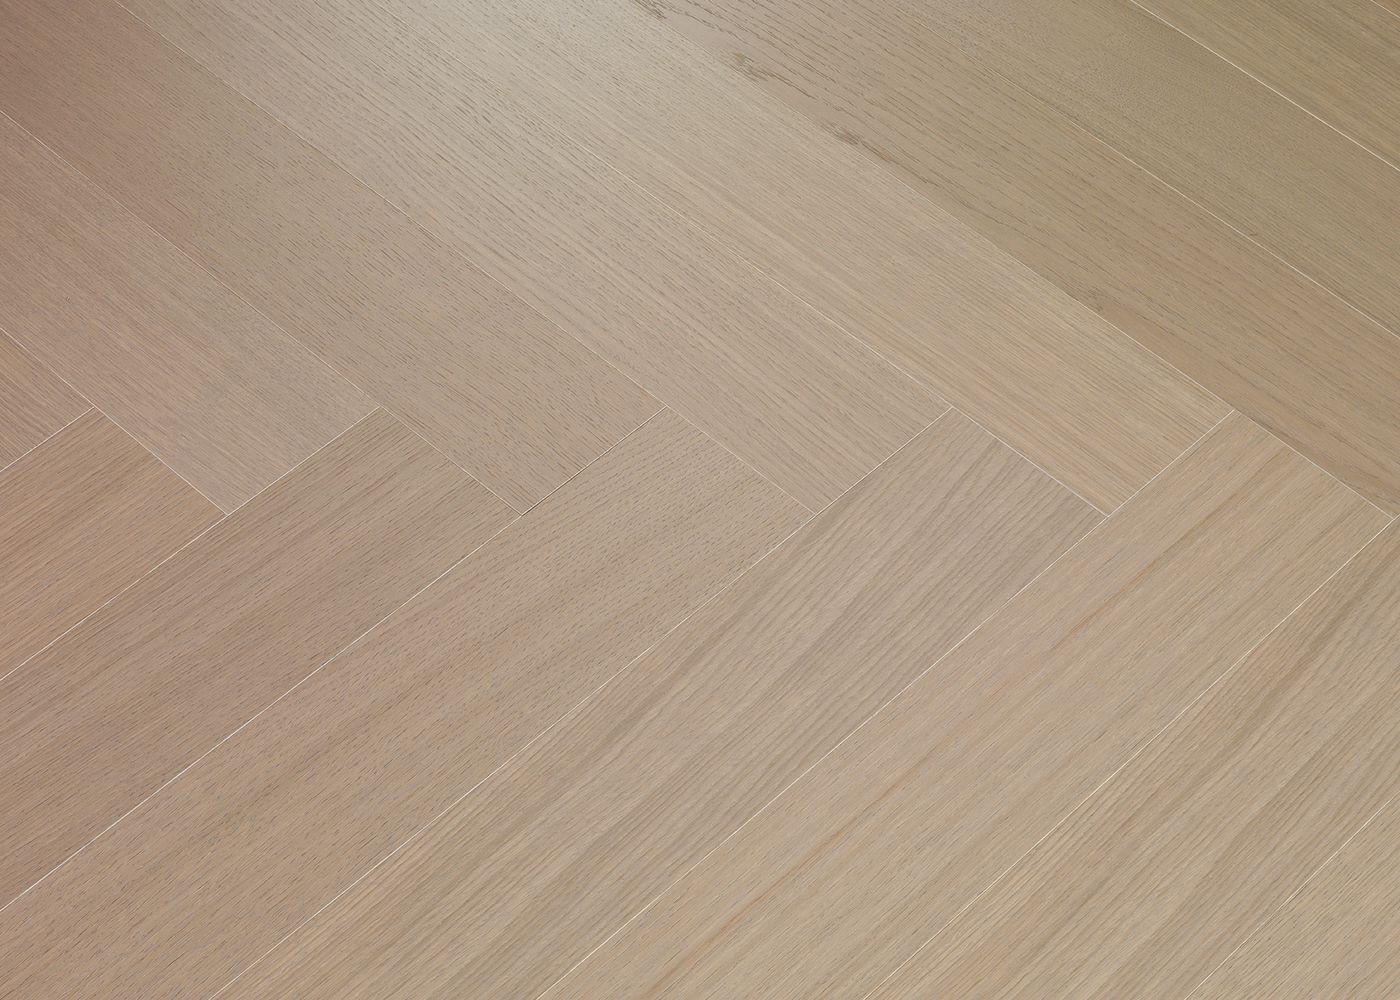 Sol plaqué bois chêne Catane Bâton rompu brossé vernis mat - Swing - Select 10x121x595